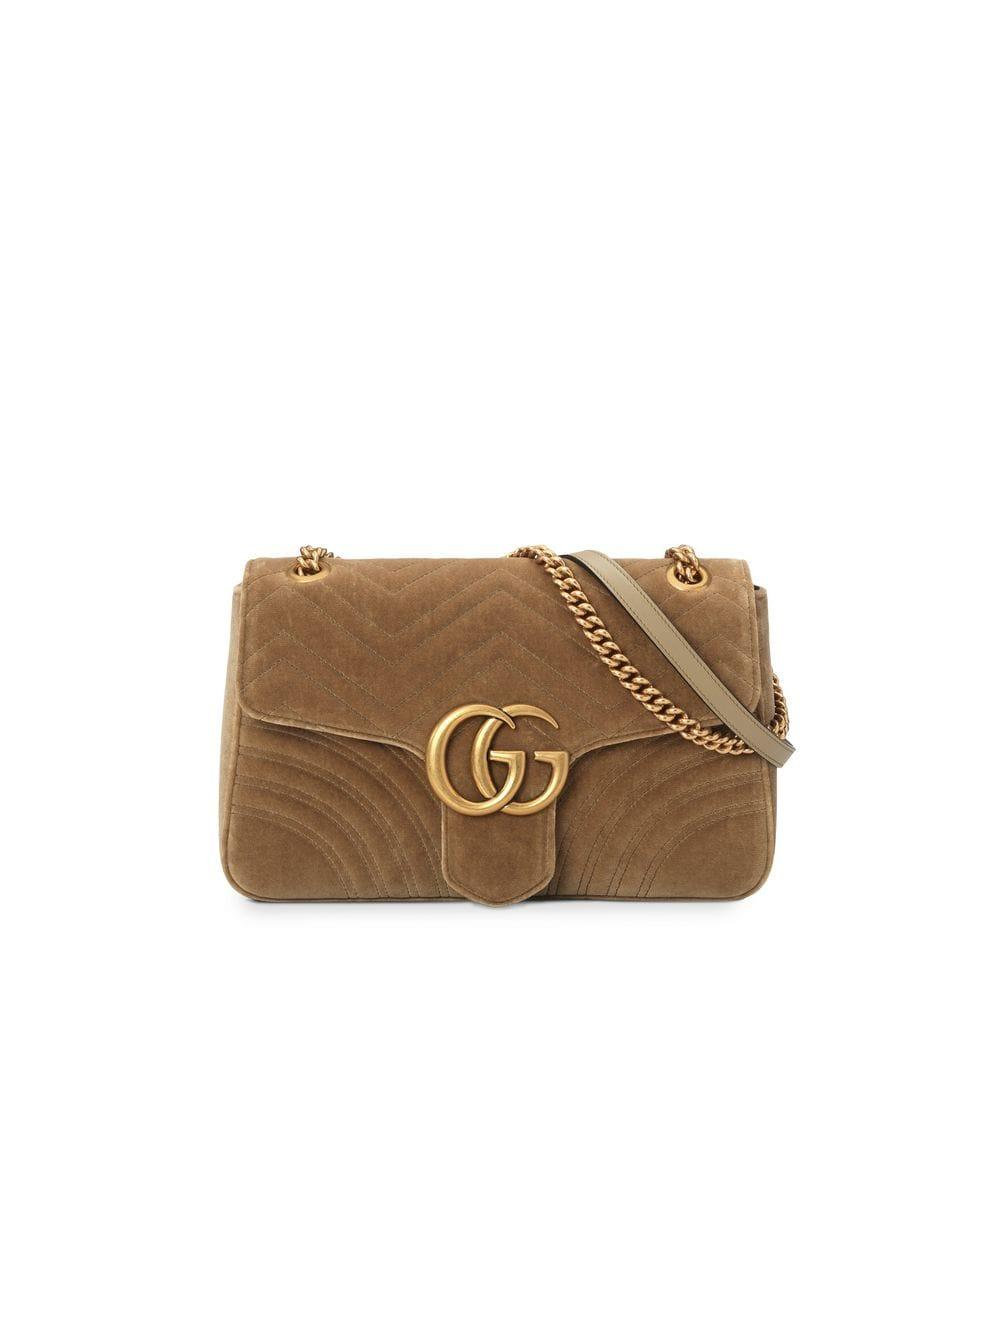 626c6382d46a Gucci Taupe GG Marmont Velvet Medium Shoulder Bag in Brown - Save 33 ...